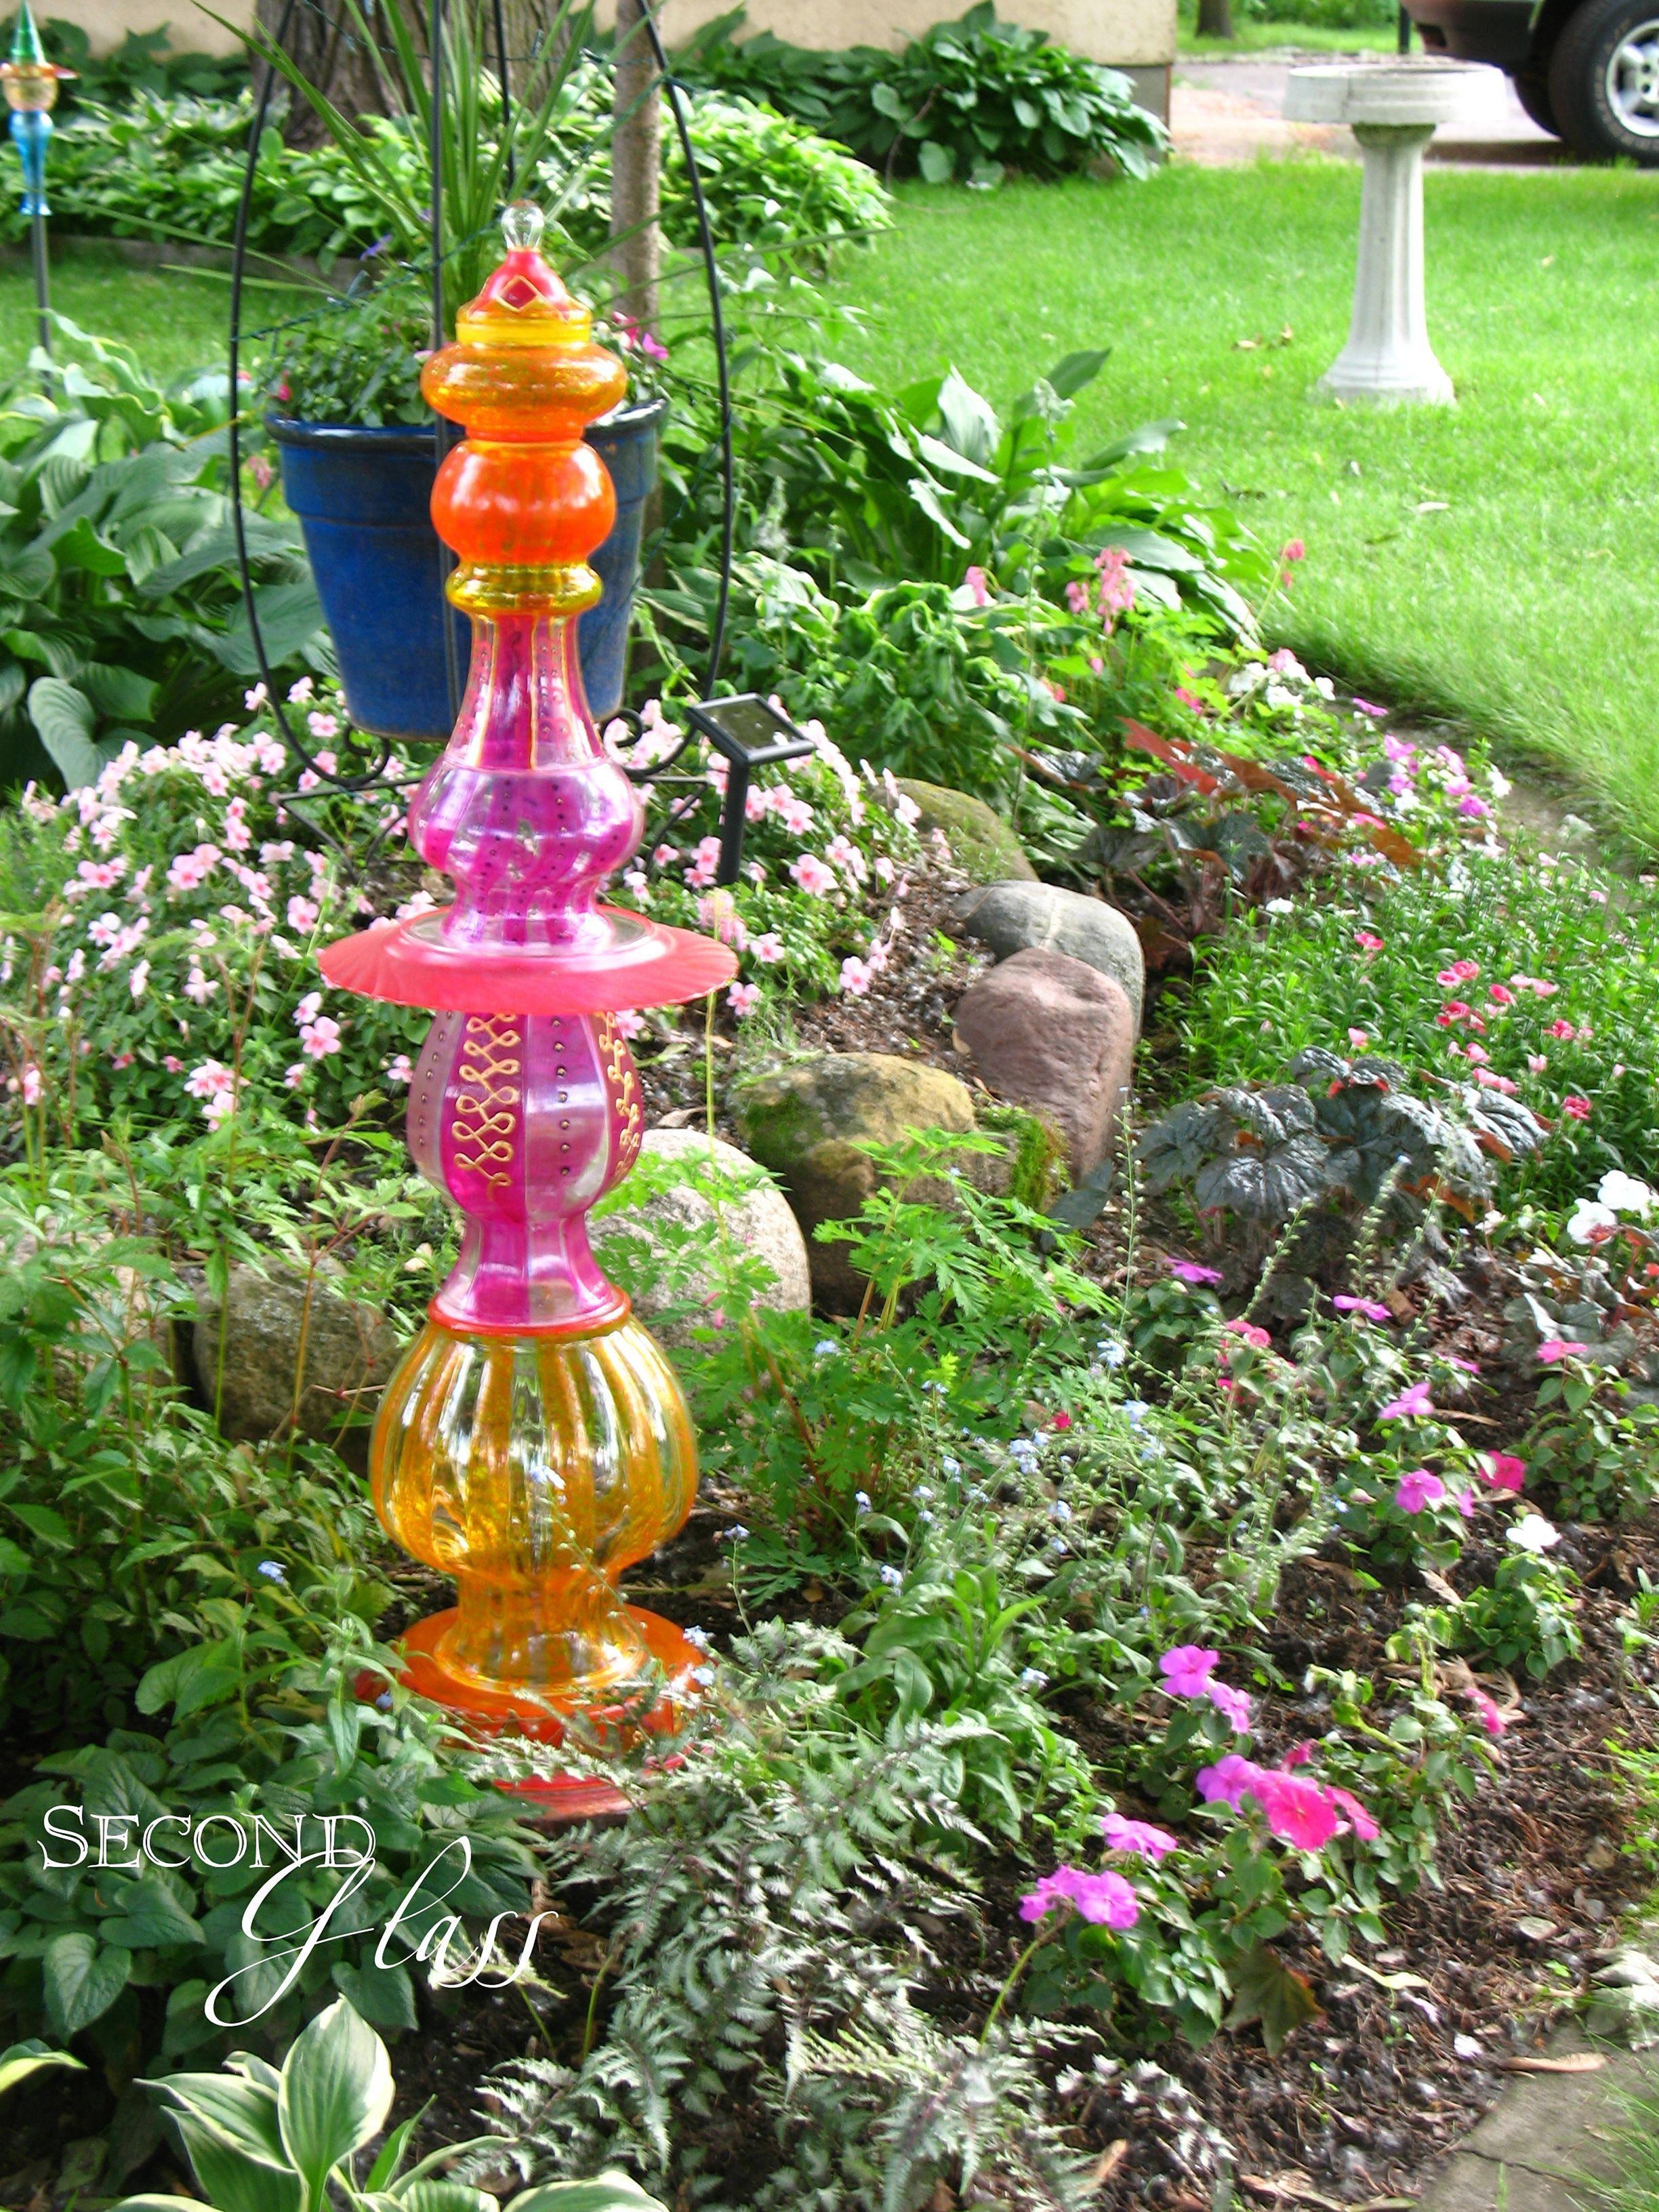 Genial ... Glass Yard Art Design Ideas For Your Garden Decor  Https://decorathing.com/garden Ideas/easy 25 Diy Glass Yard  Art Design Ideas For Your Garden Decor/